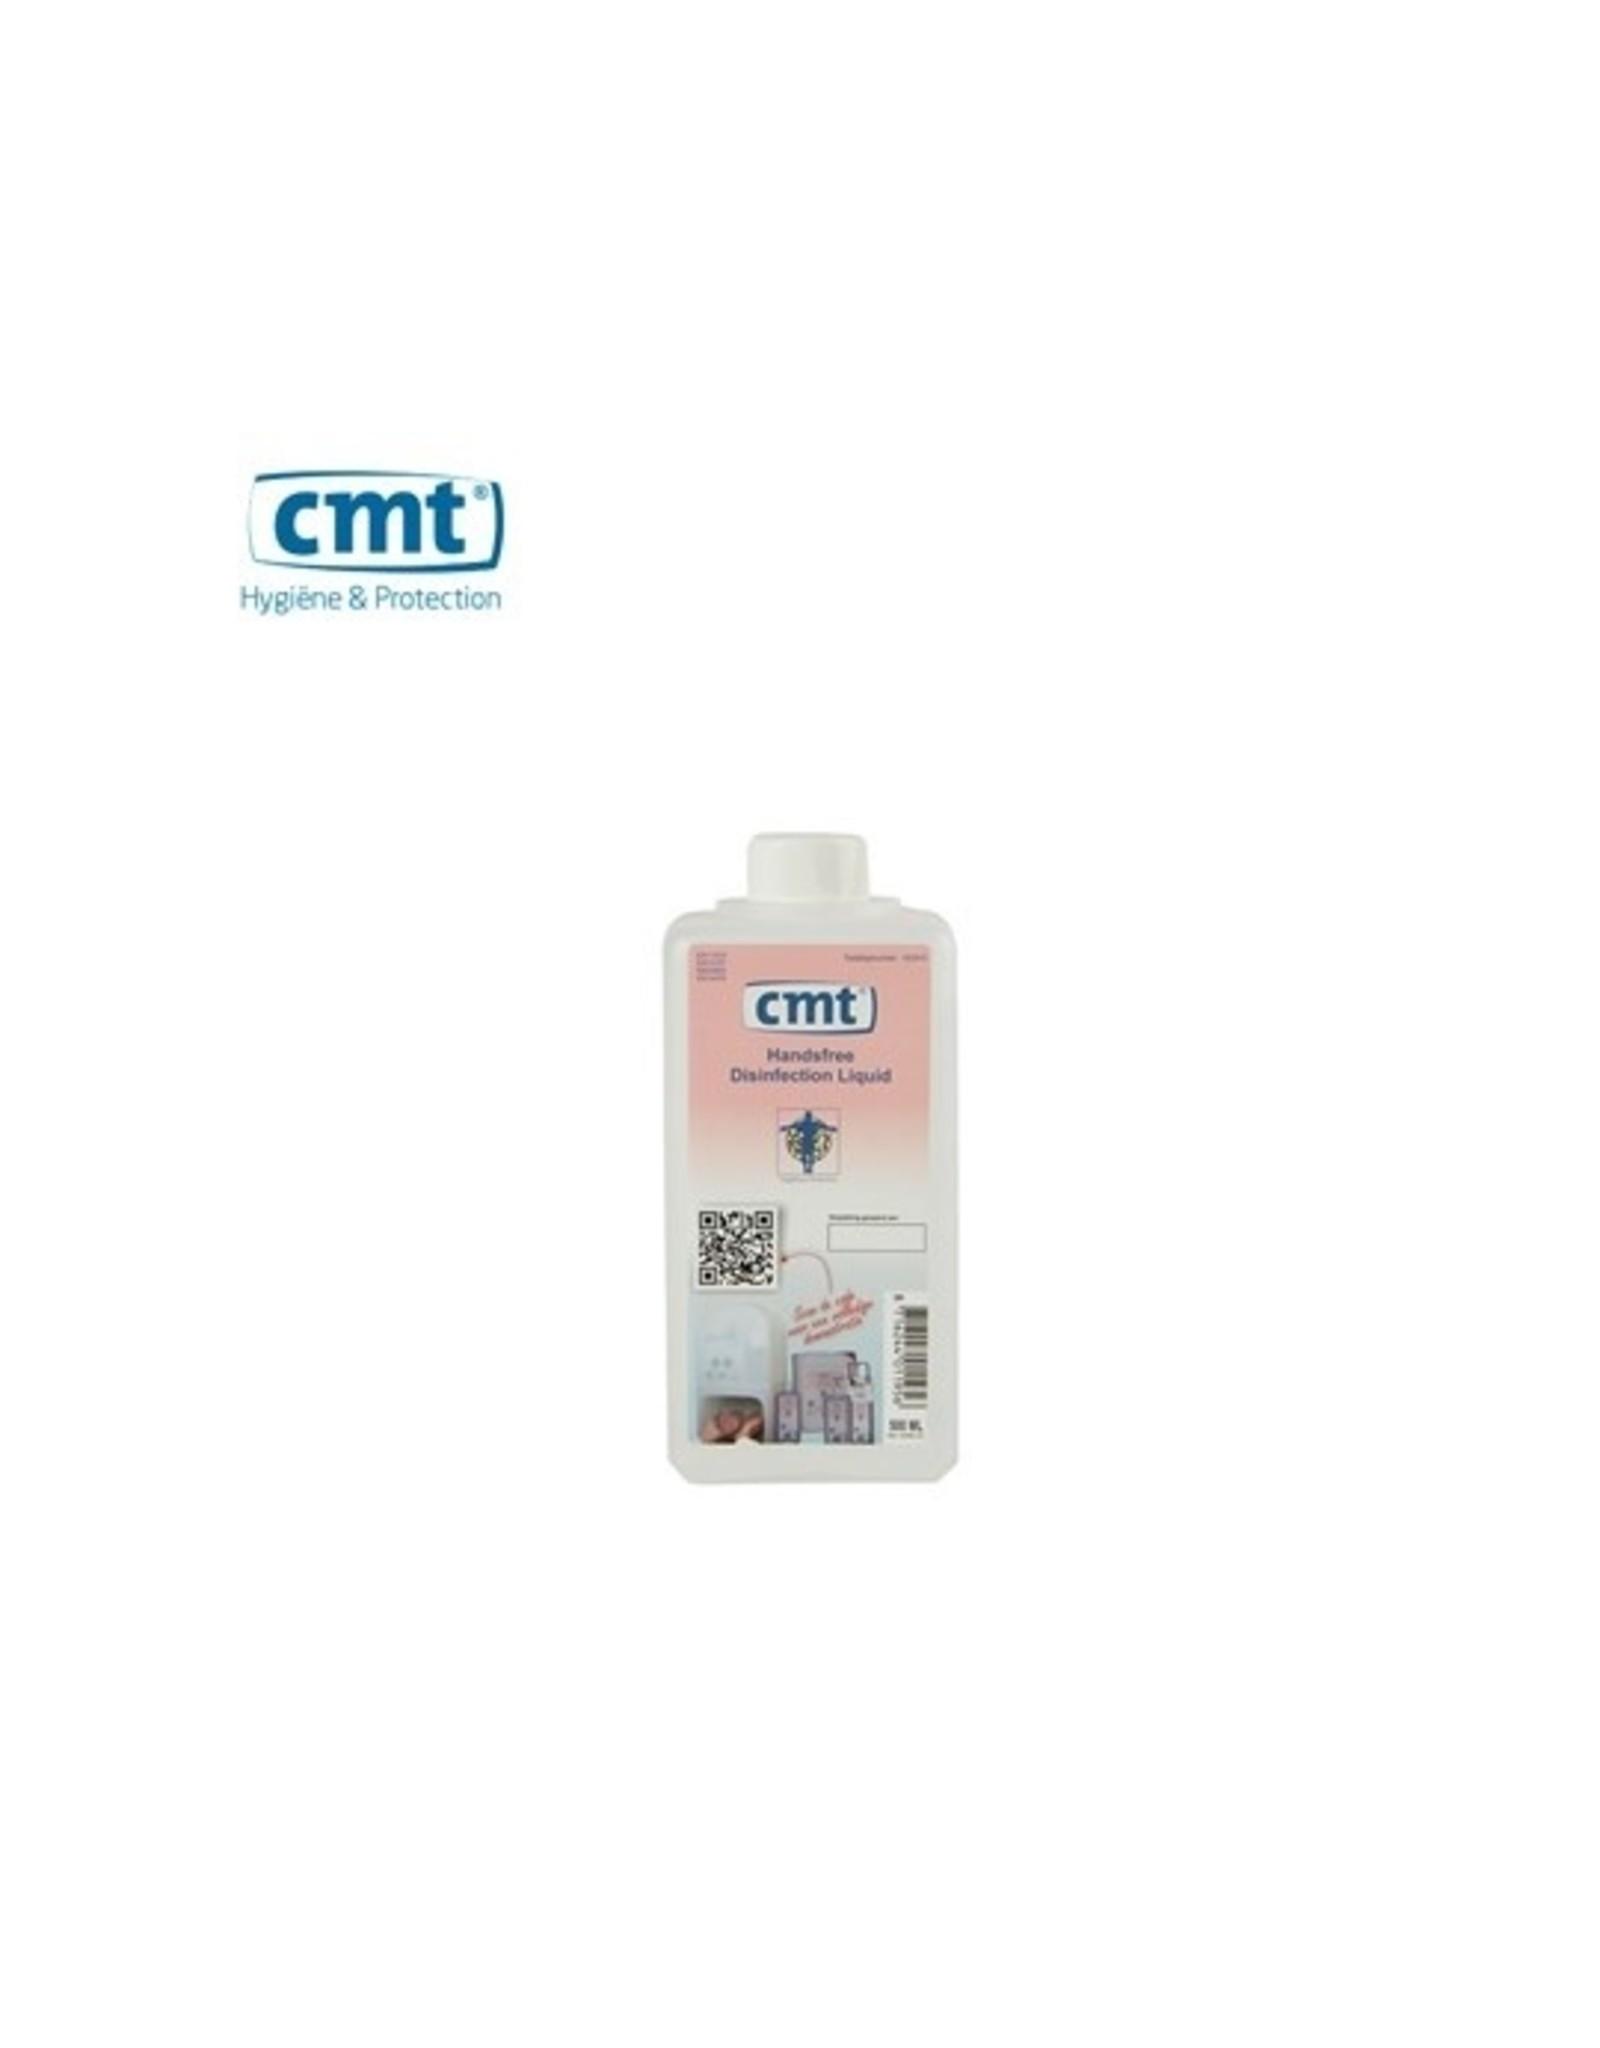 CMT CMT Handsfree® Disinfection Liquid 500ml /flacon